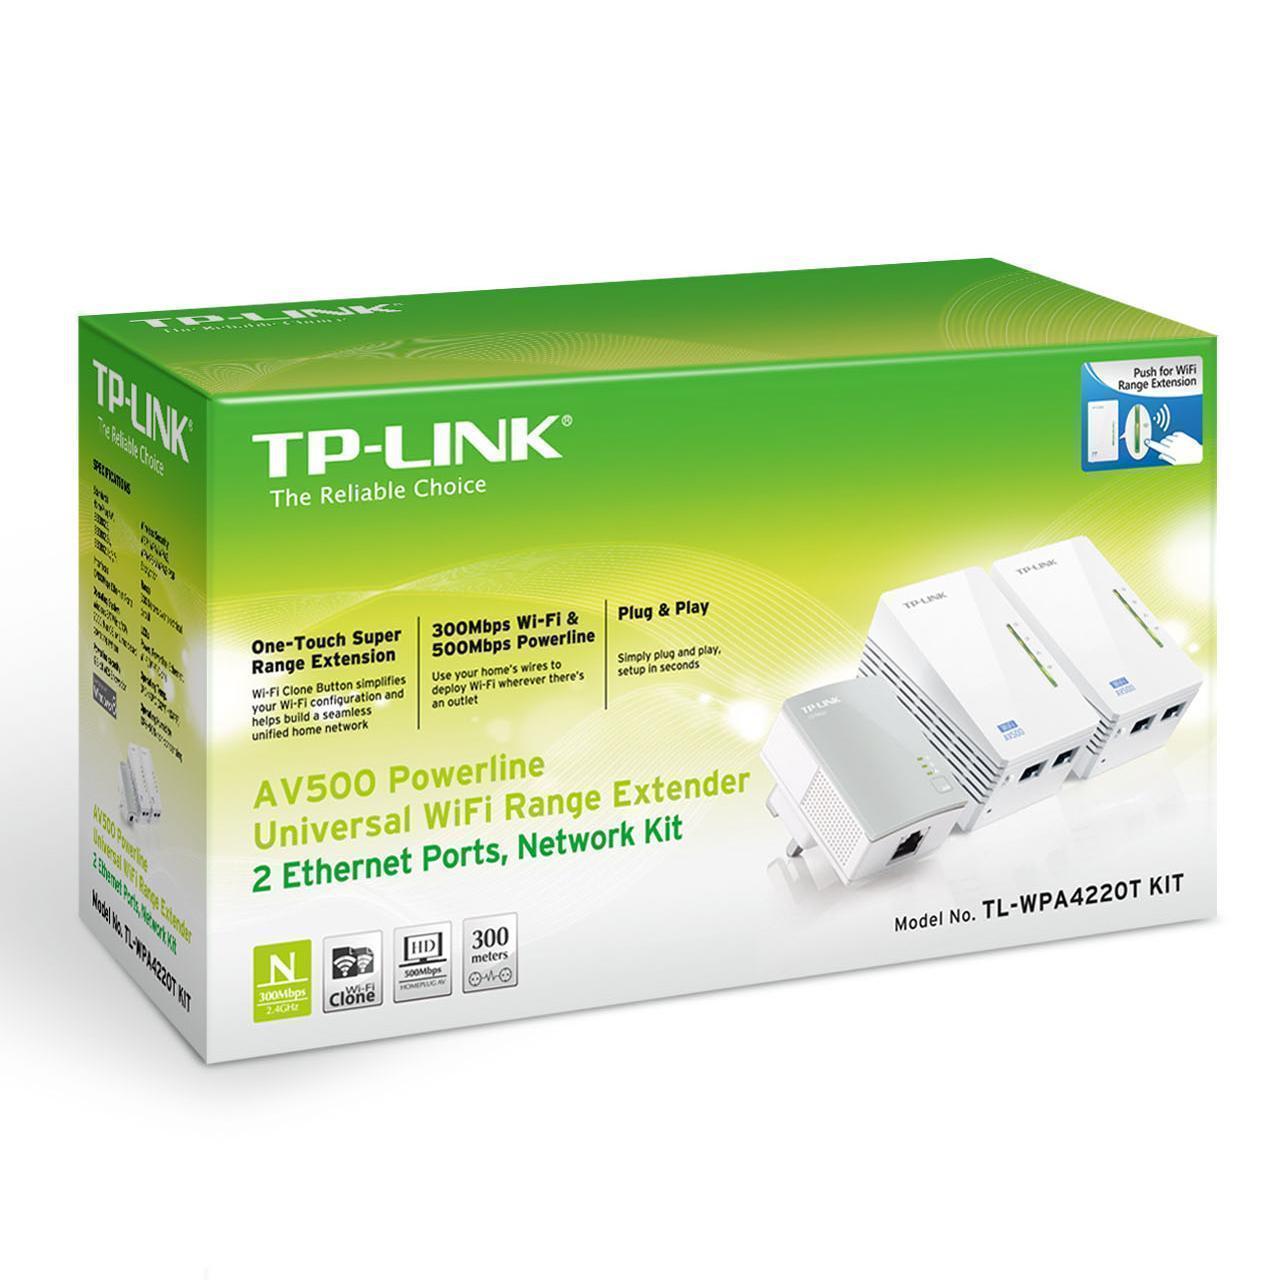 TP-LINK TL-WPA4220 300Mbps Powerline Wireless Extender